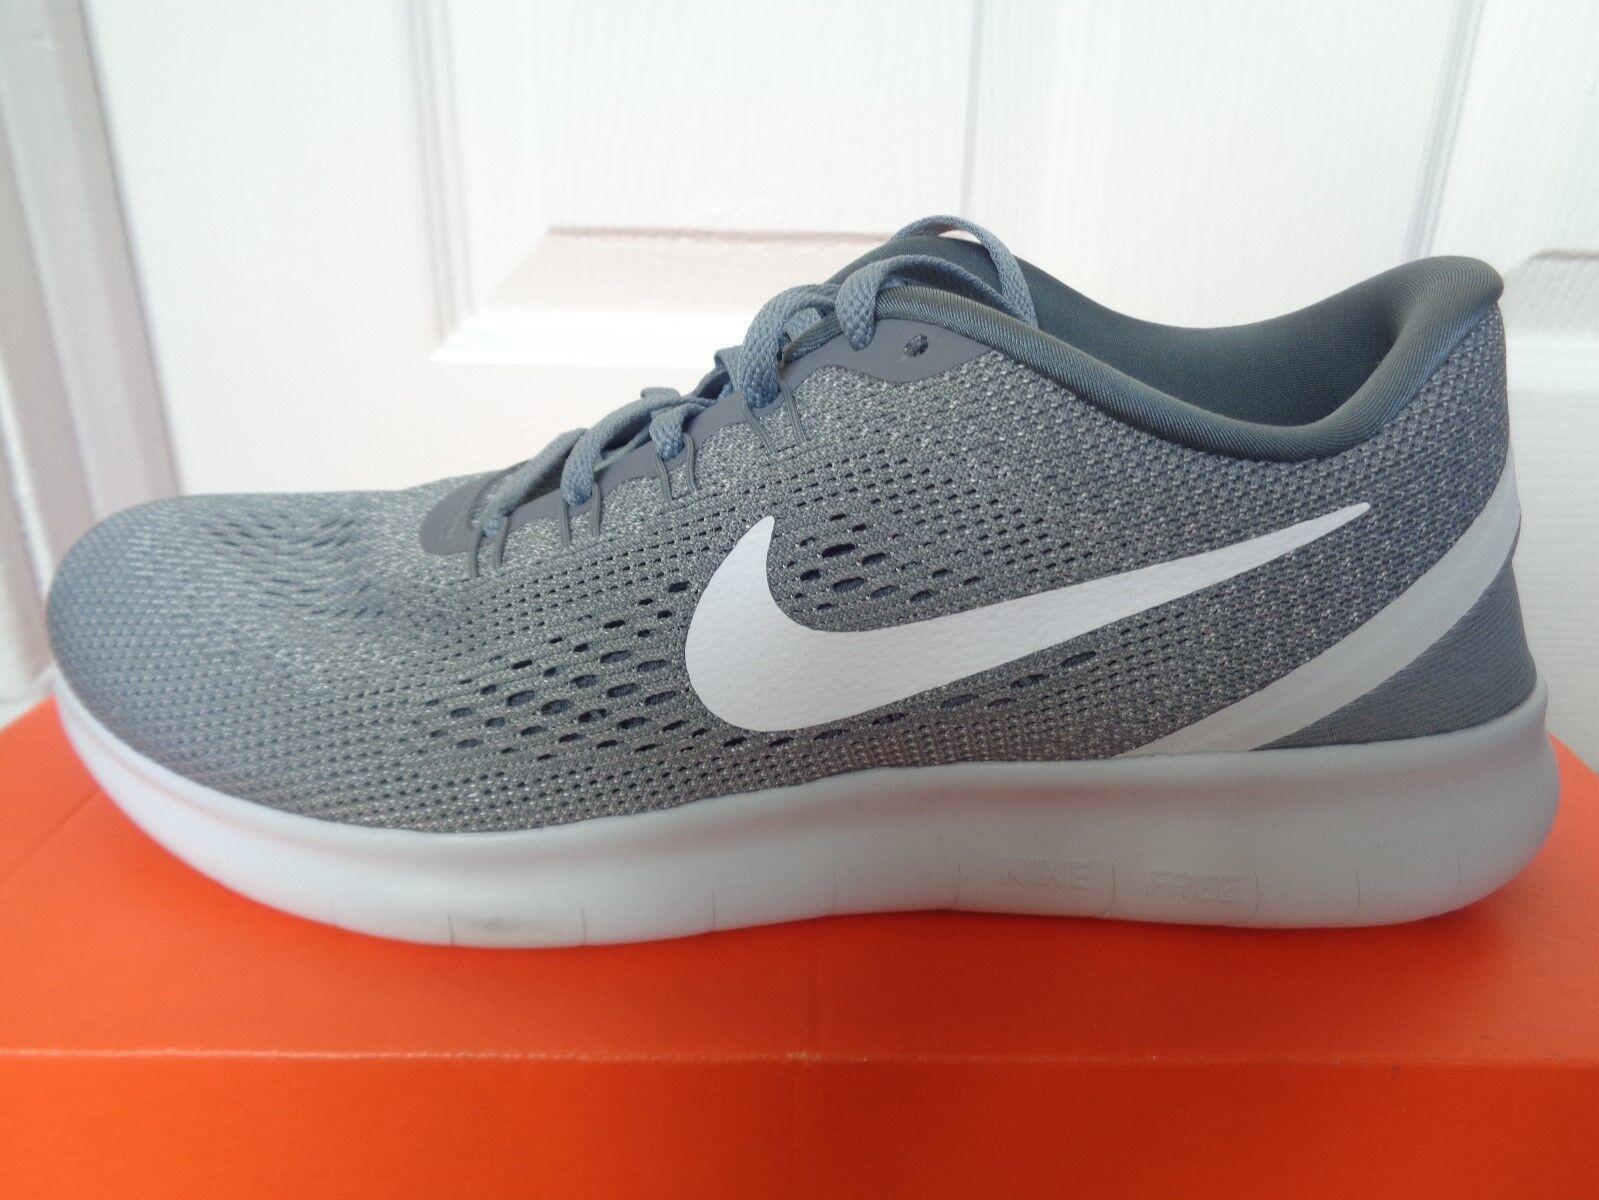 Nike Free RN homme trainers sneakers 831508 013 uk 7 eu 41 us 8 NEW+BOX